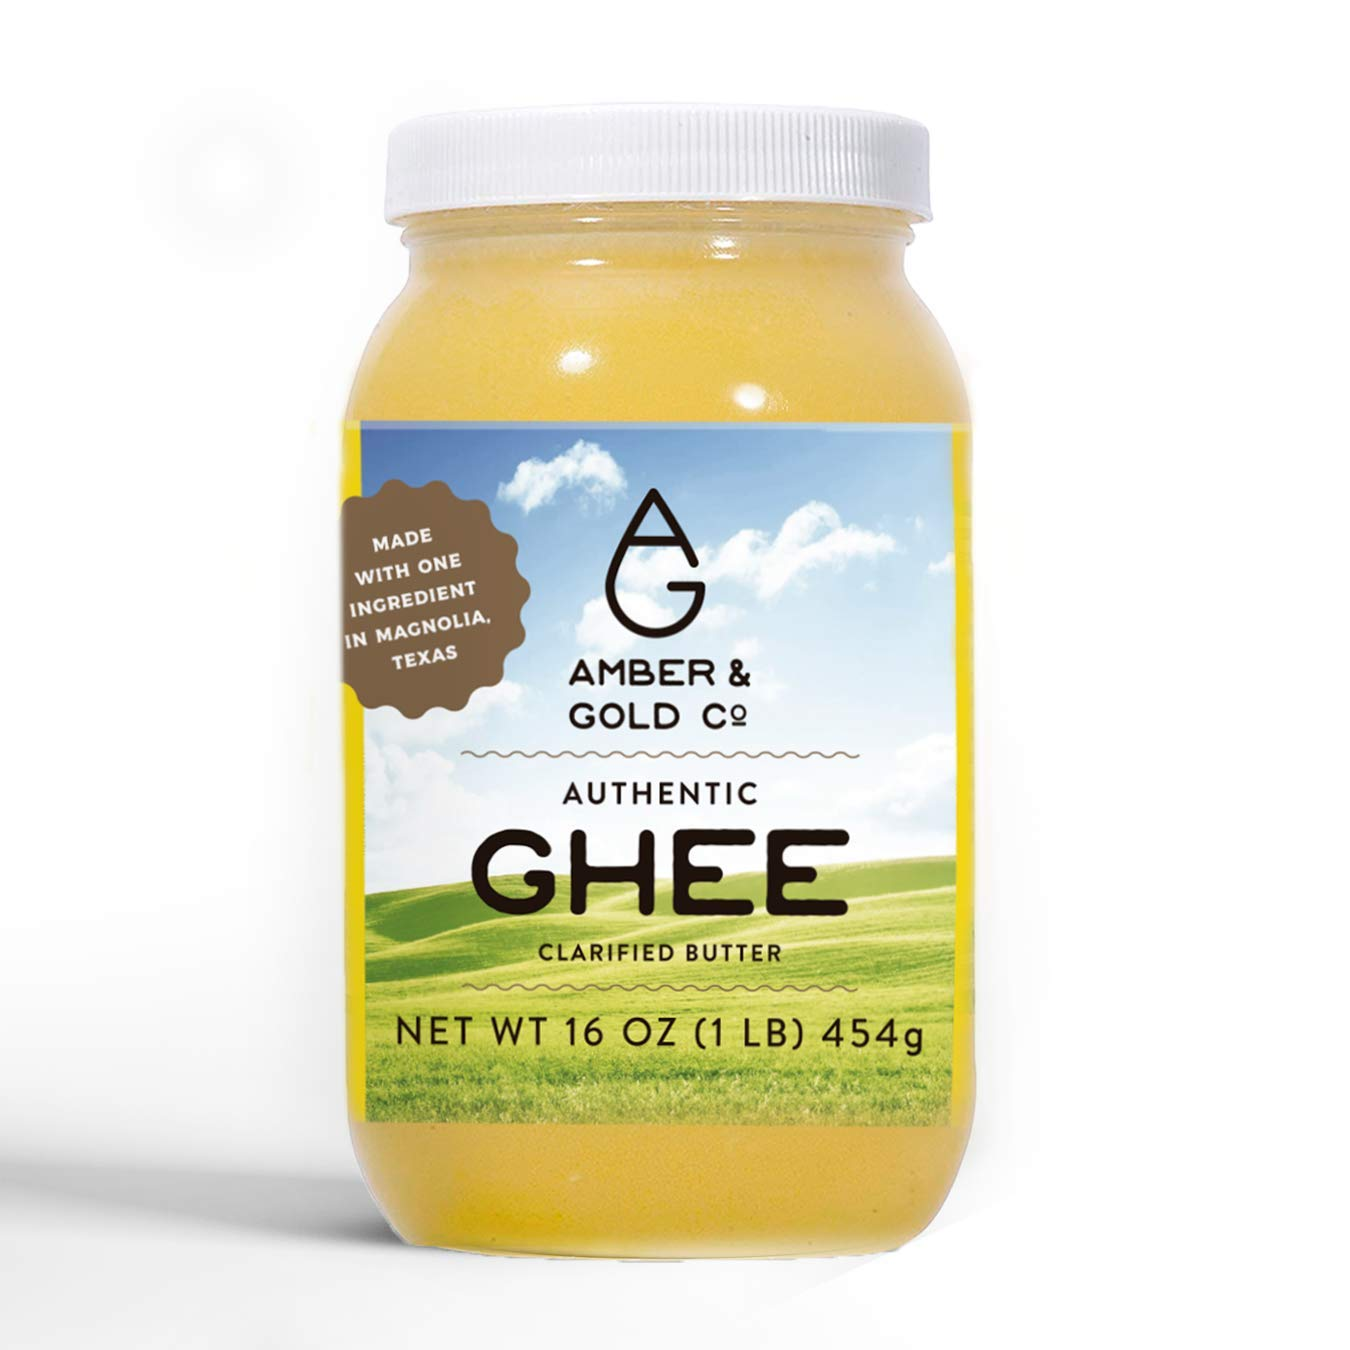 Ghee - Clarified Butter (16 oz)